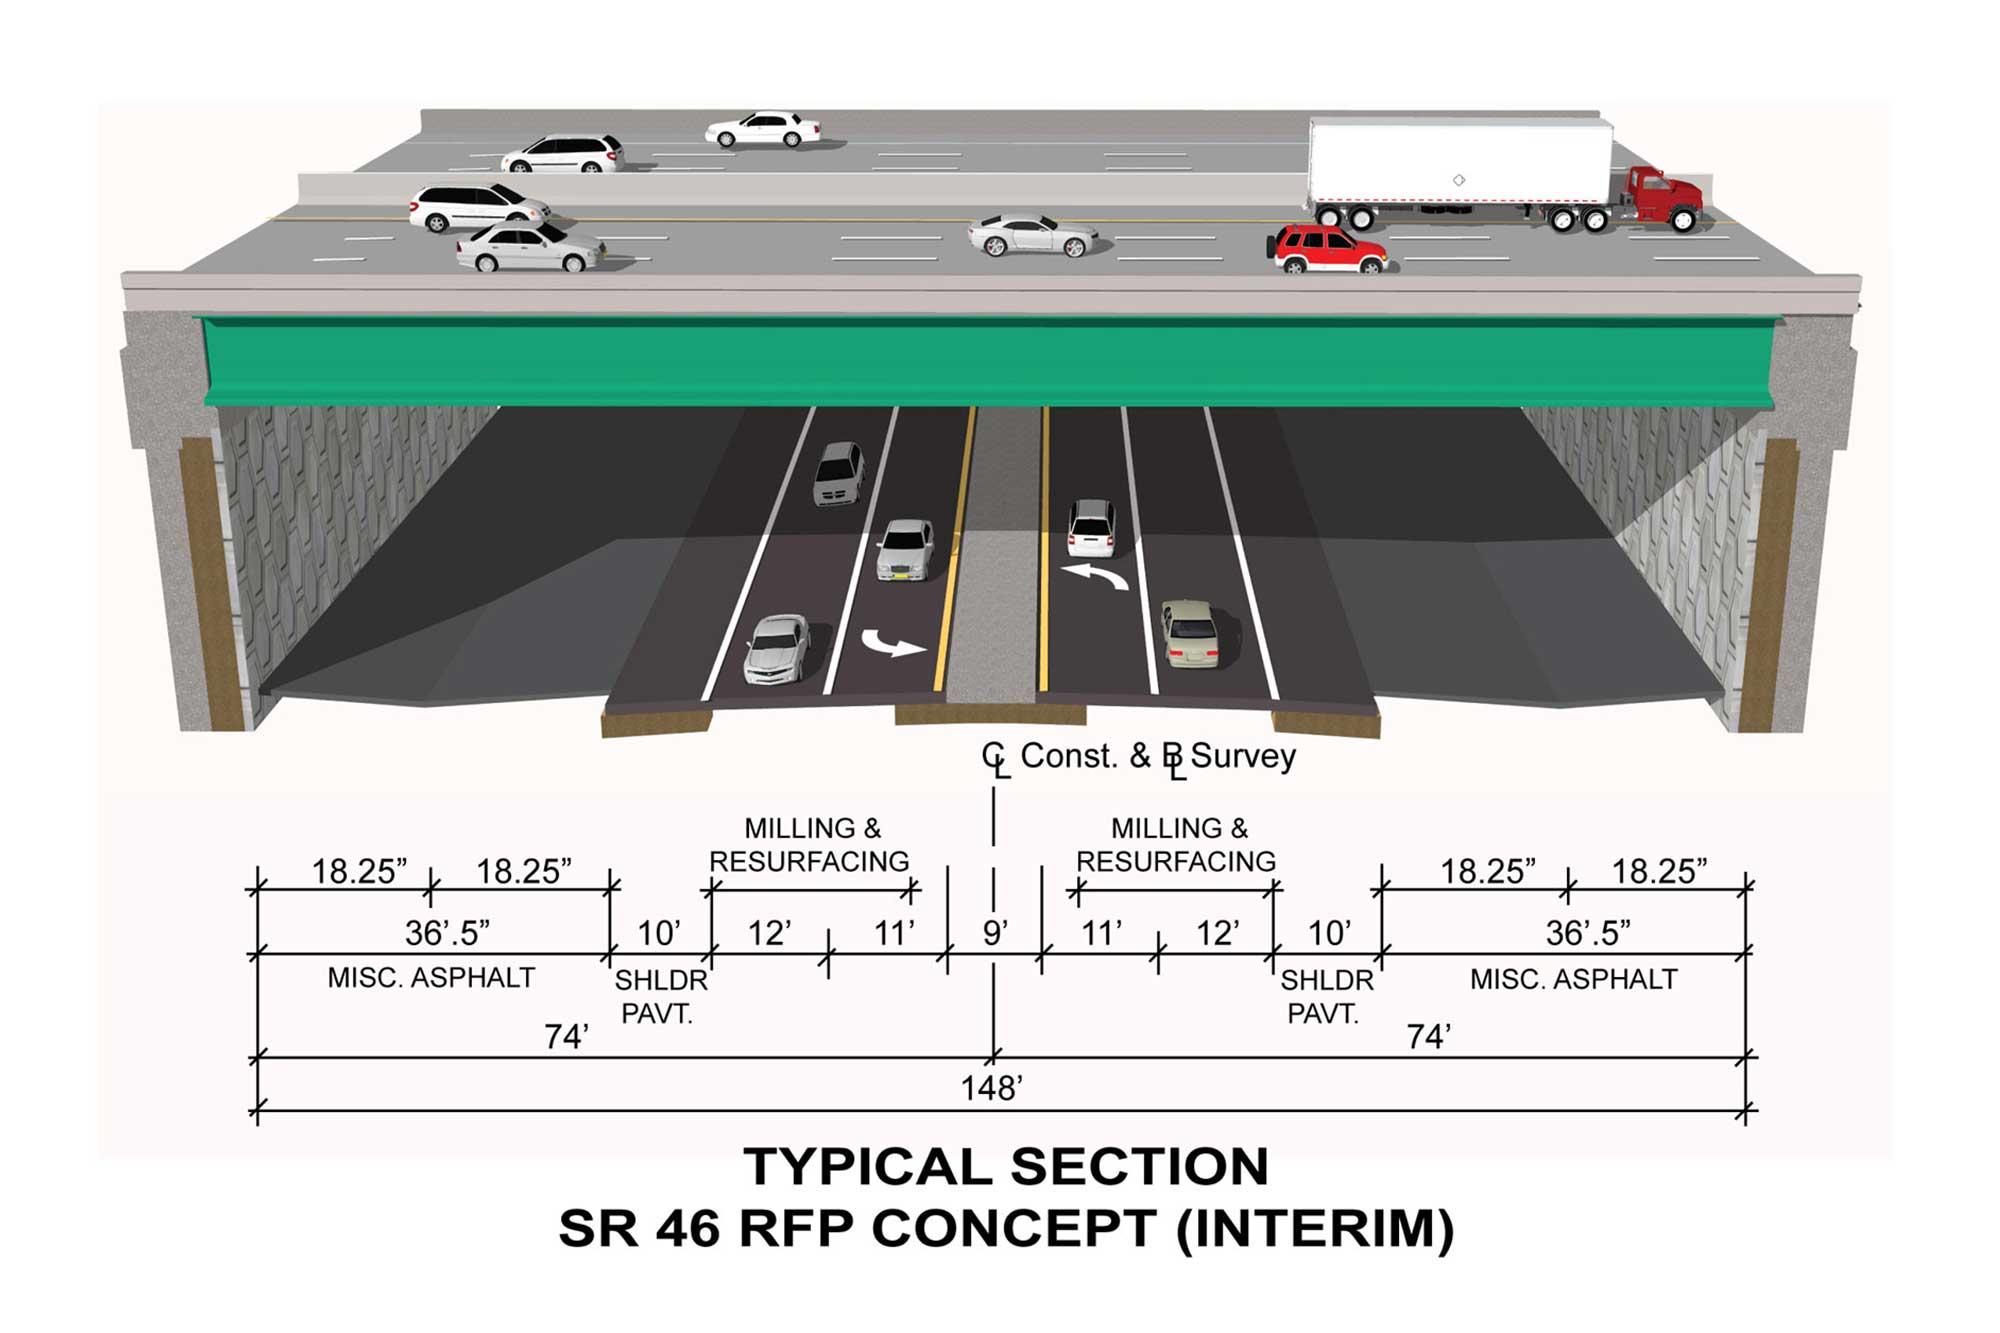 SR 46 RFP Concept